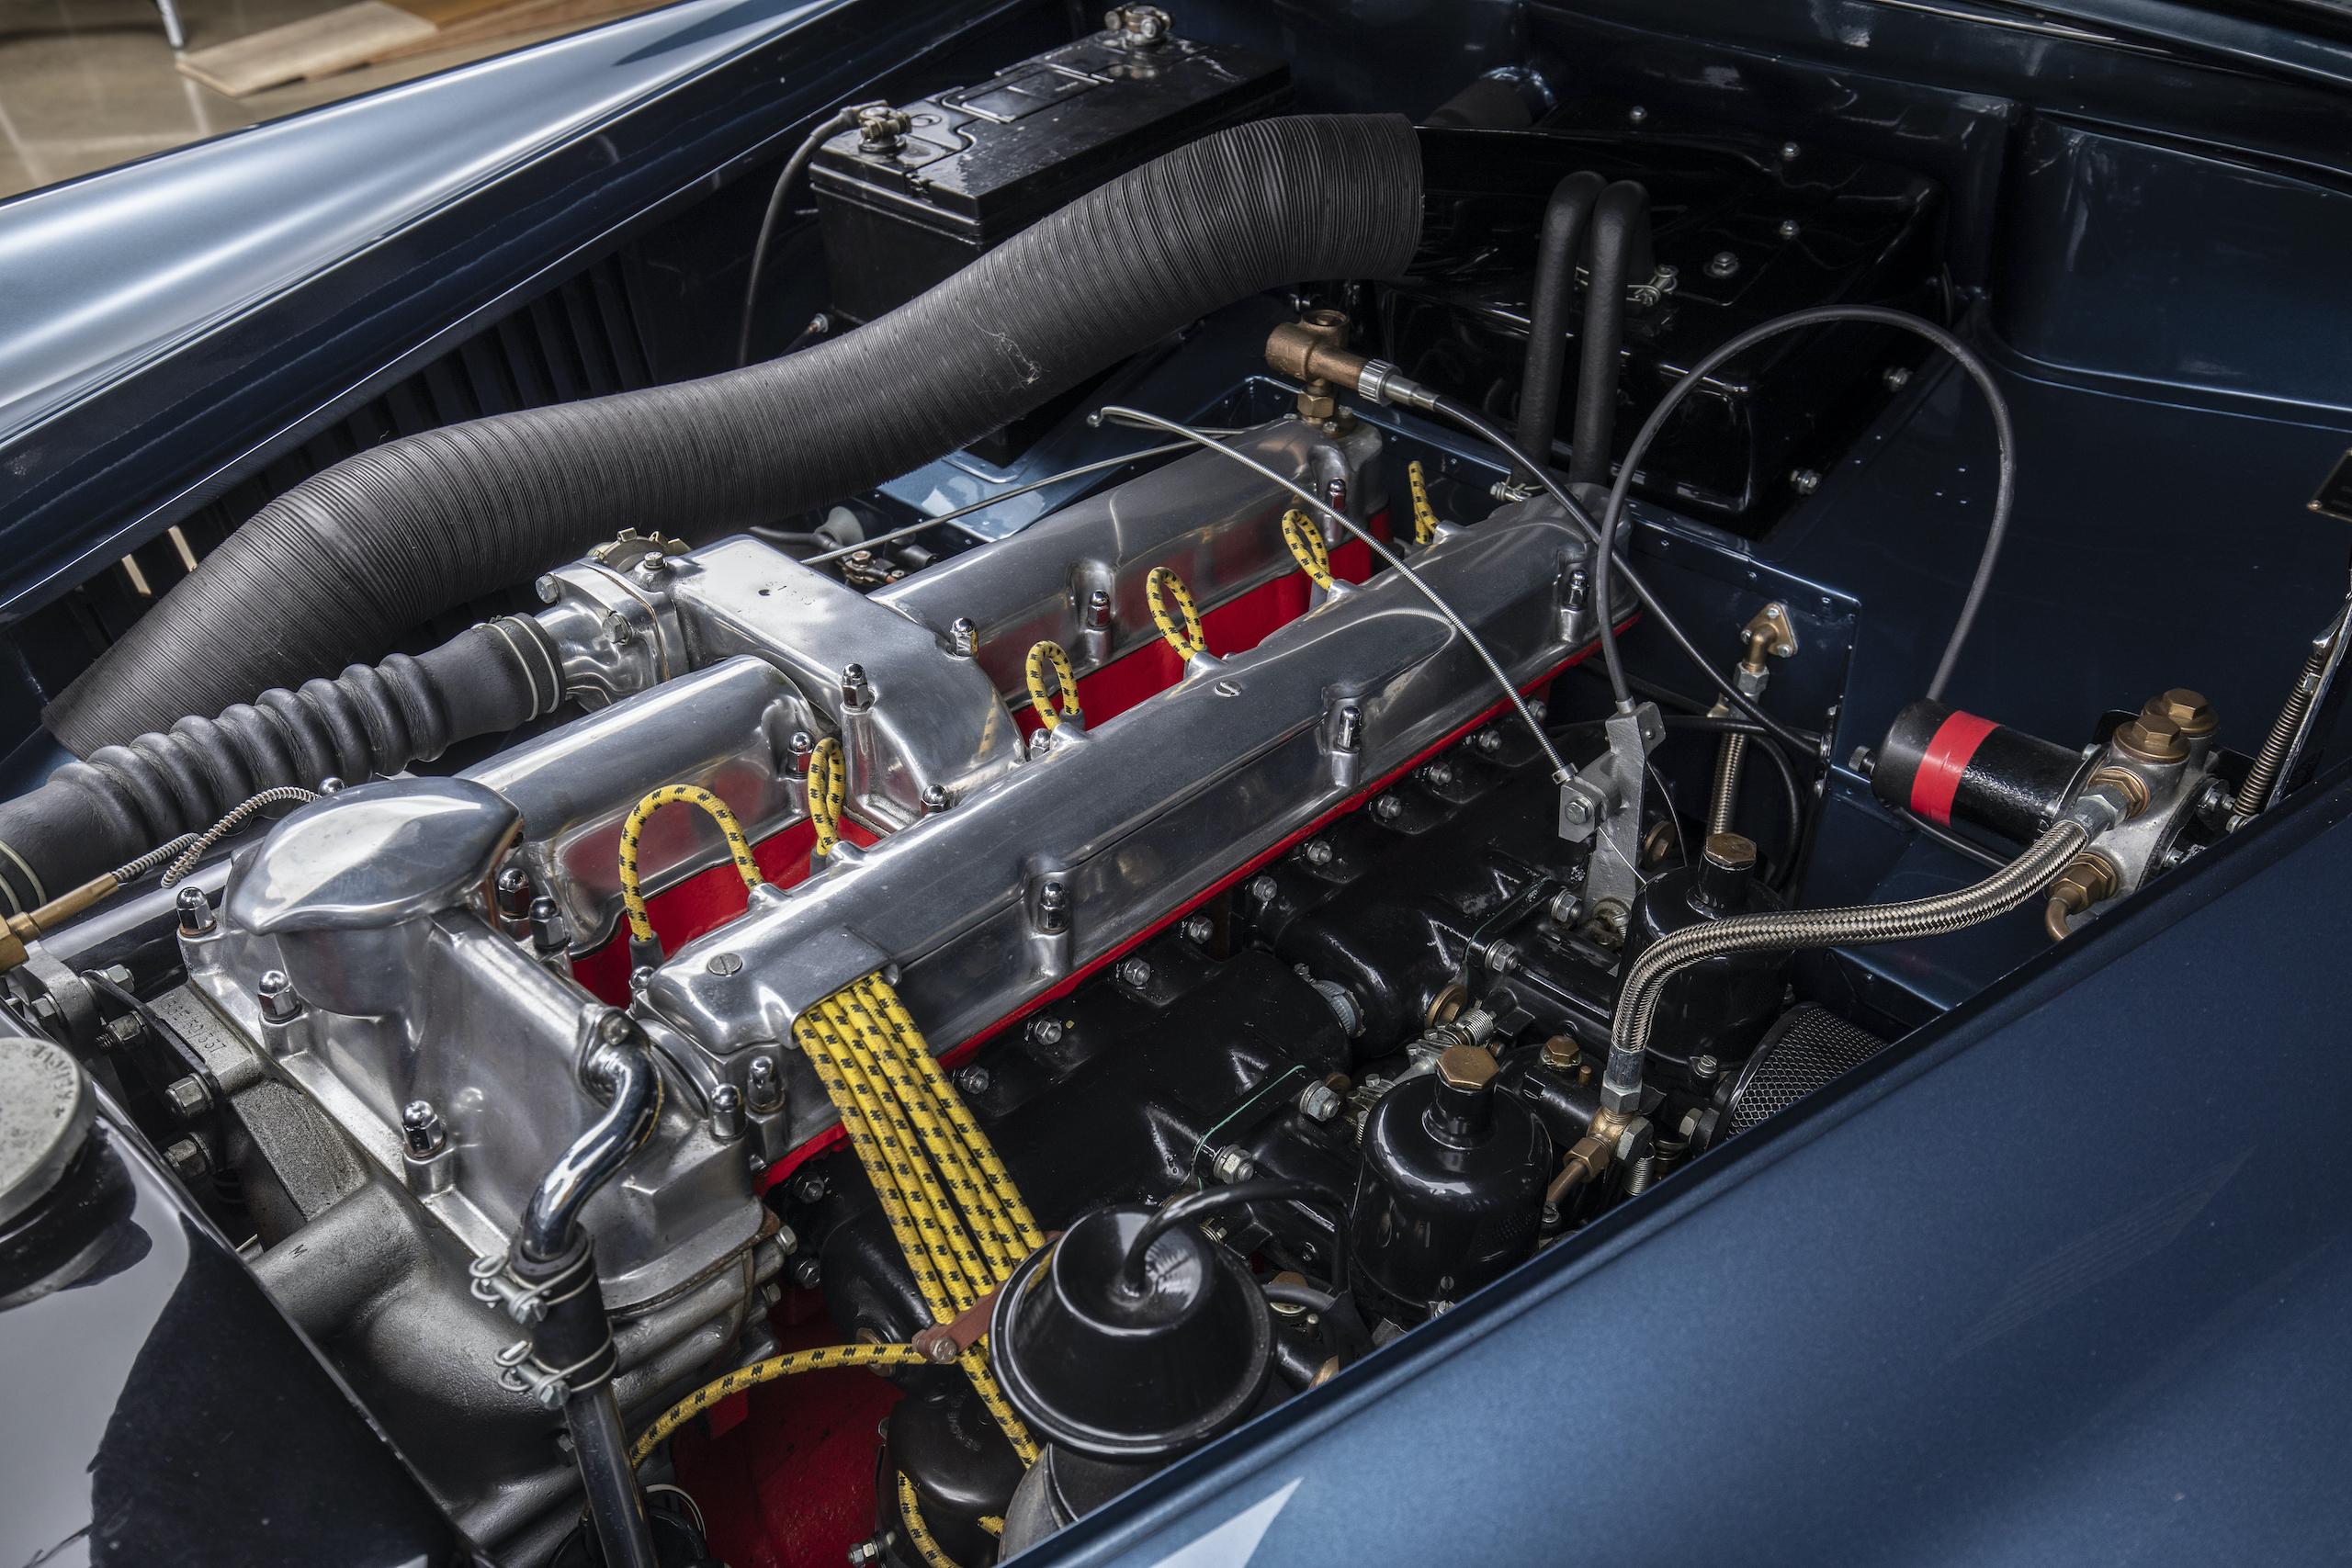 aston martin db4 drophead coupe bertone engine